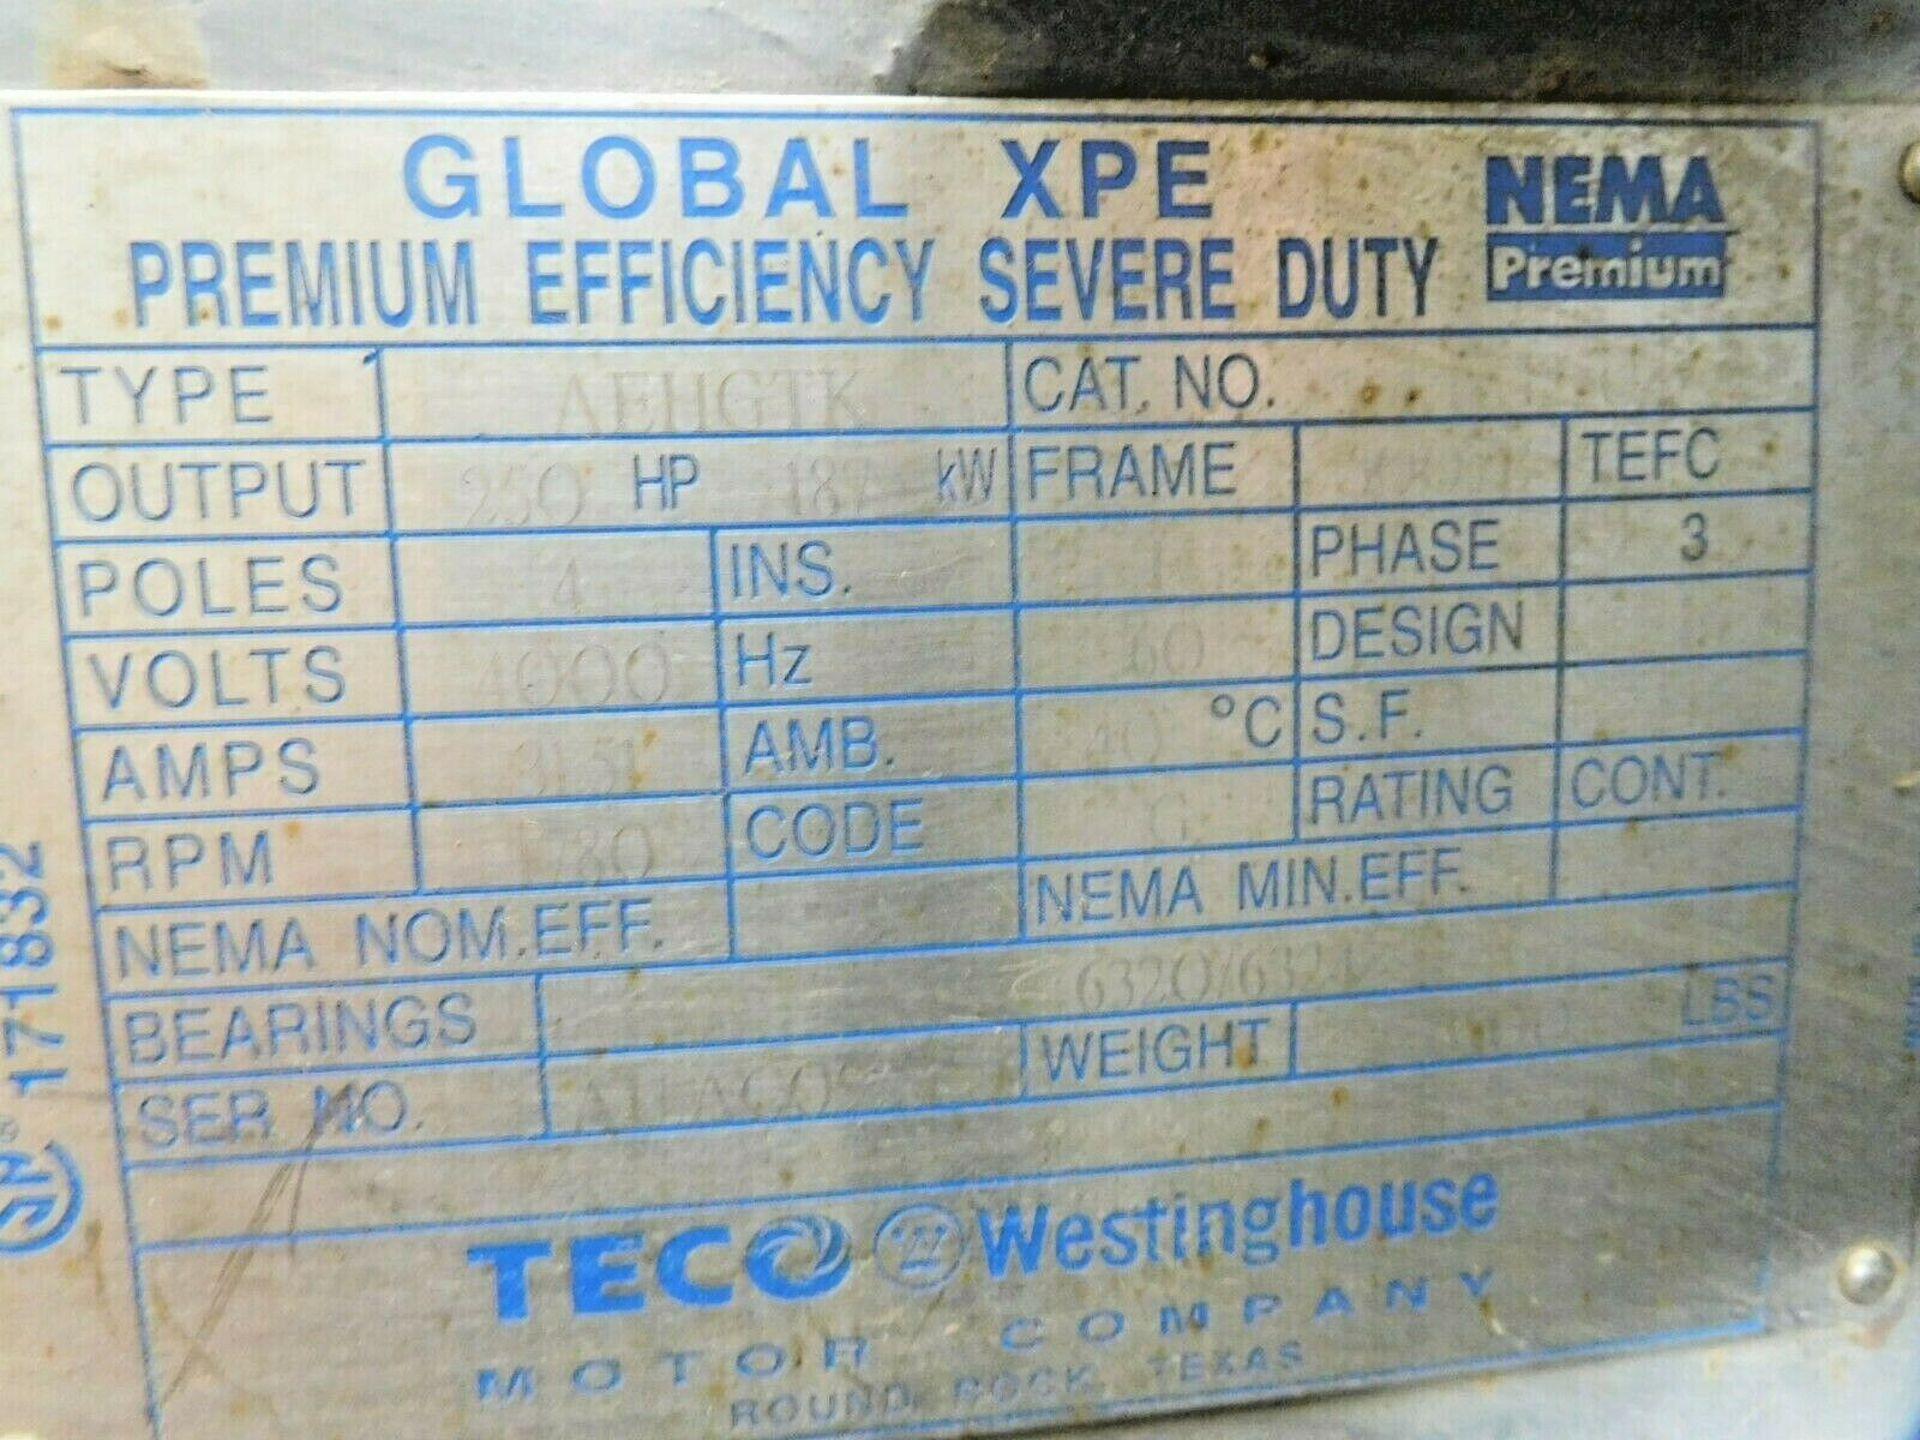 Teco Westinghouse KG2504 Motor. 250 HP. 1780 RPM. 4000 V. 5007B. TEFC. 60 Hz. 3 Ph. AEHGTK. - Image 4 of 4